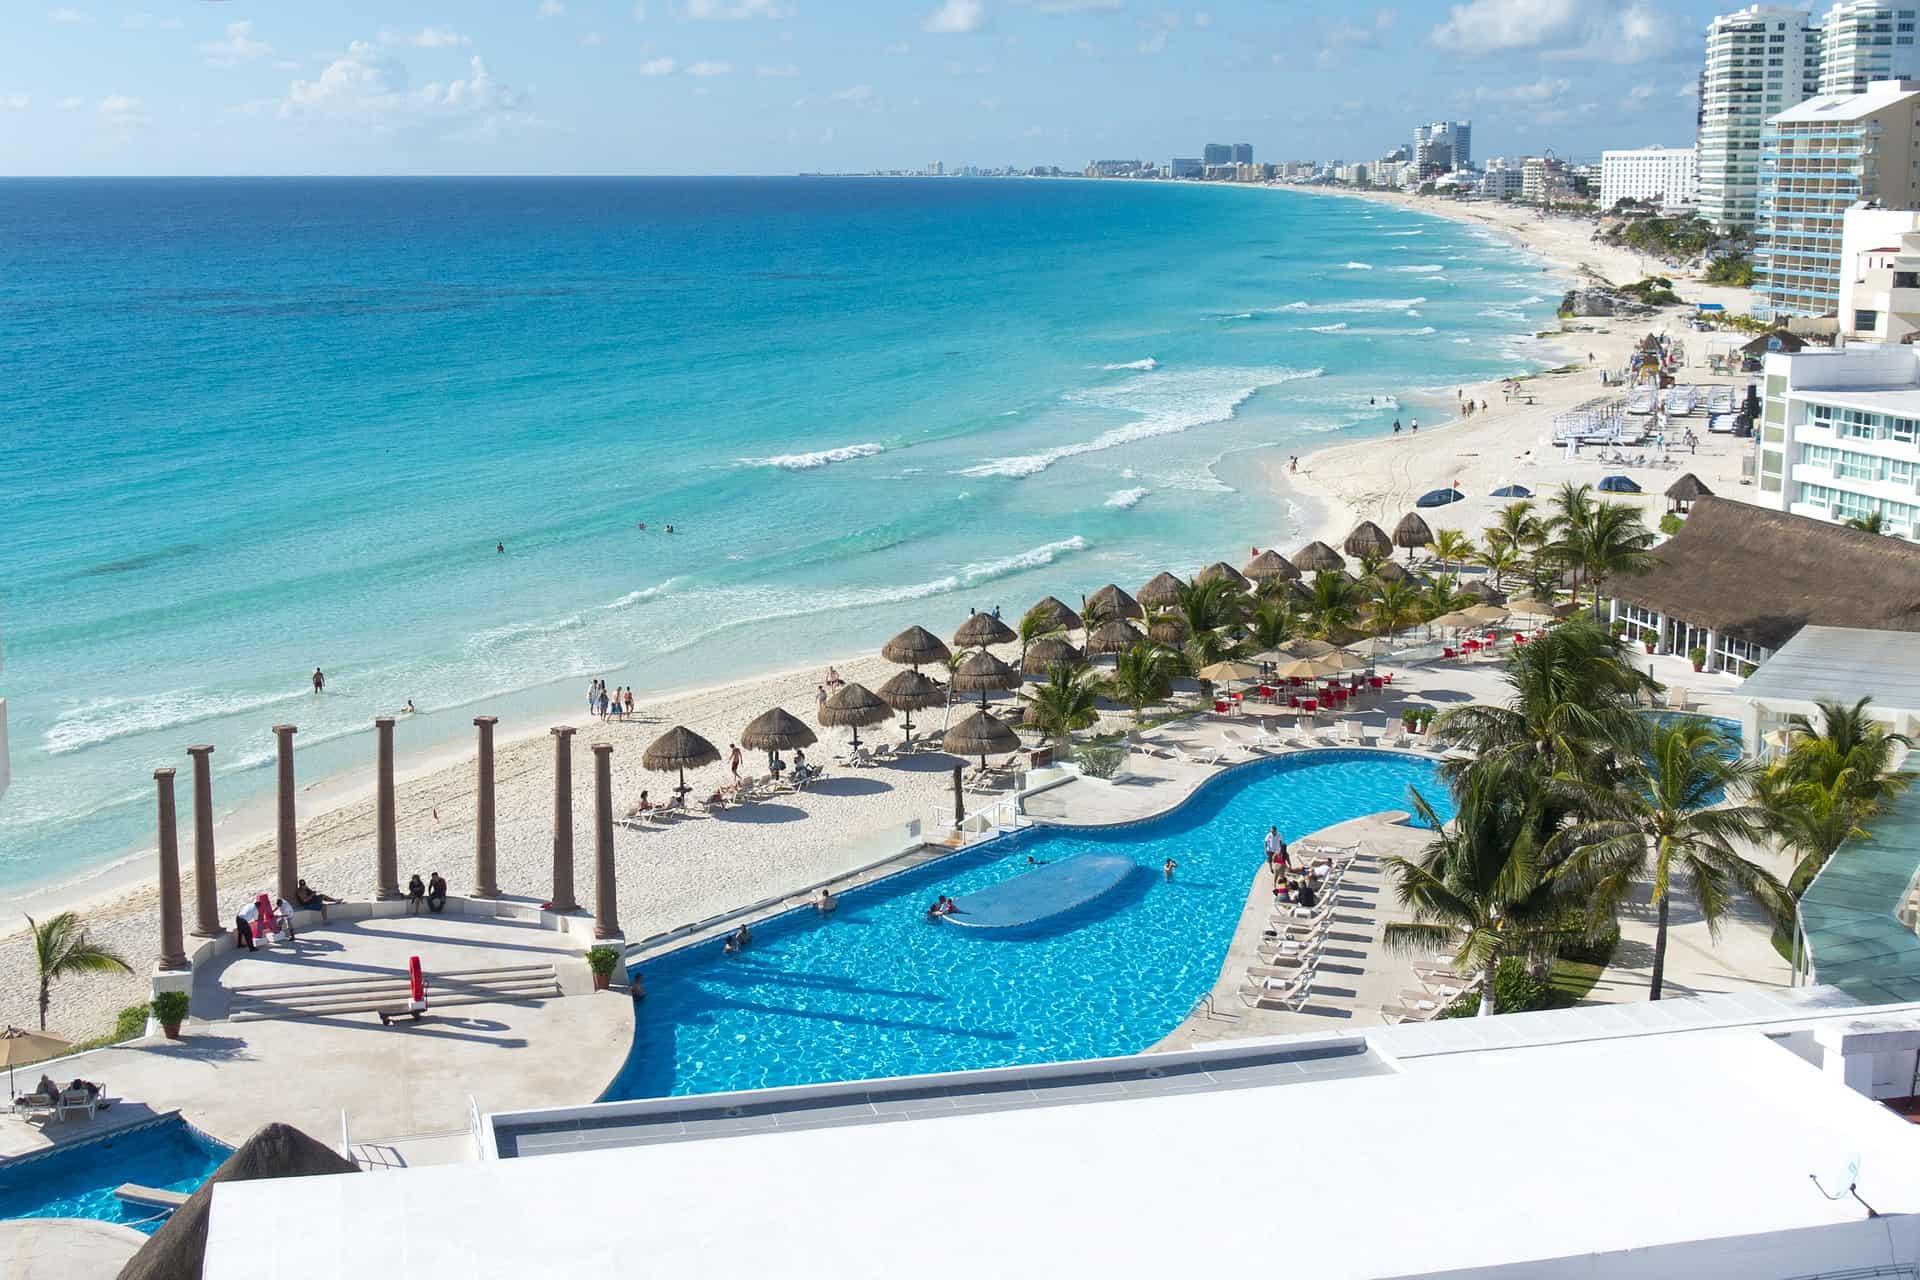 Cancun Urlaub günstig - ab 548,82€ Fernreisen nach Mexiko